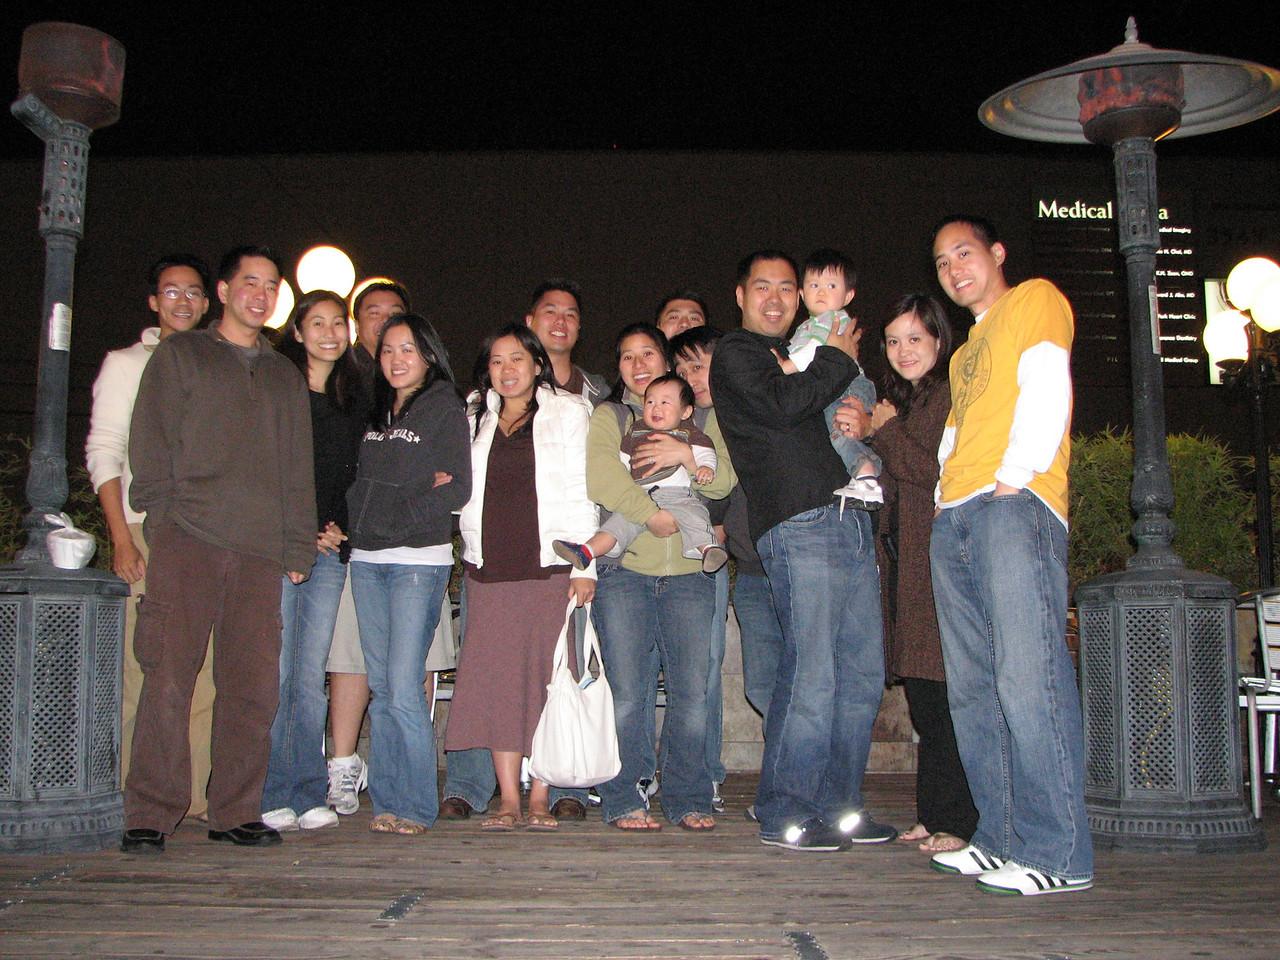 2008 05 24 Sat - Group photo - Bernice Chen visits L A